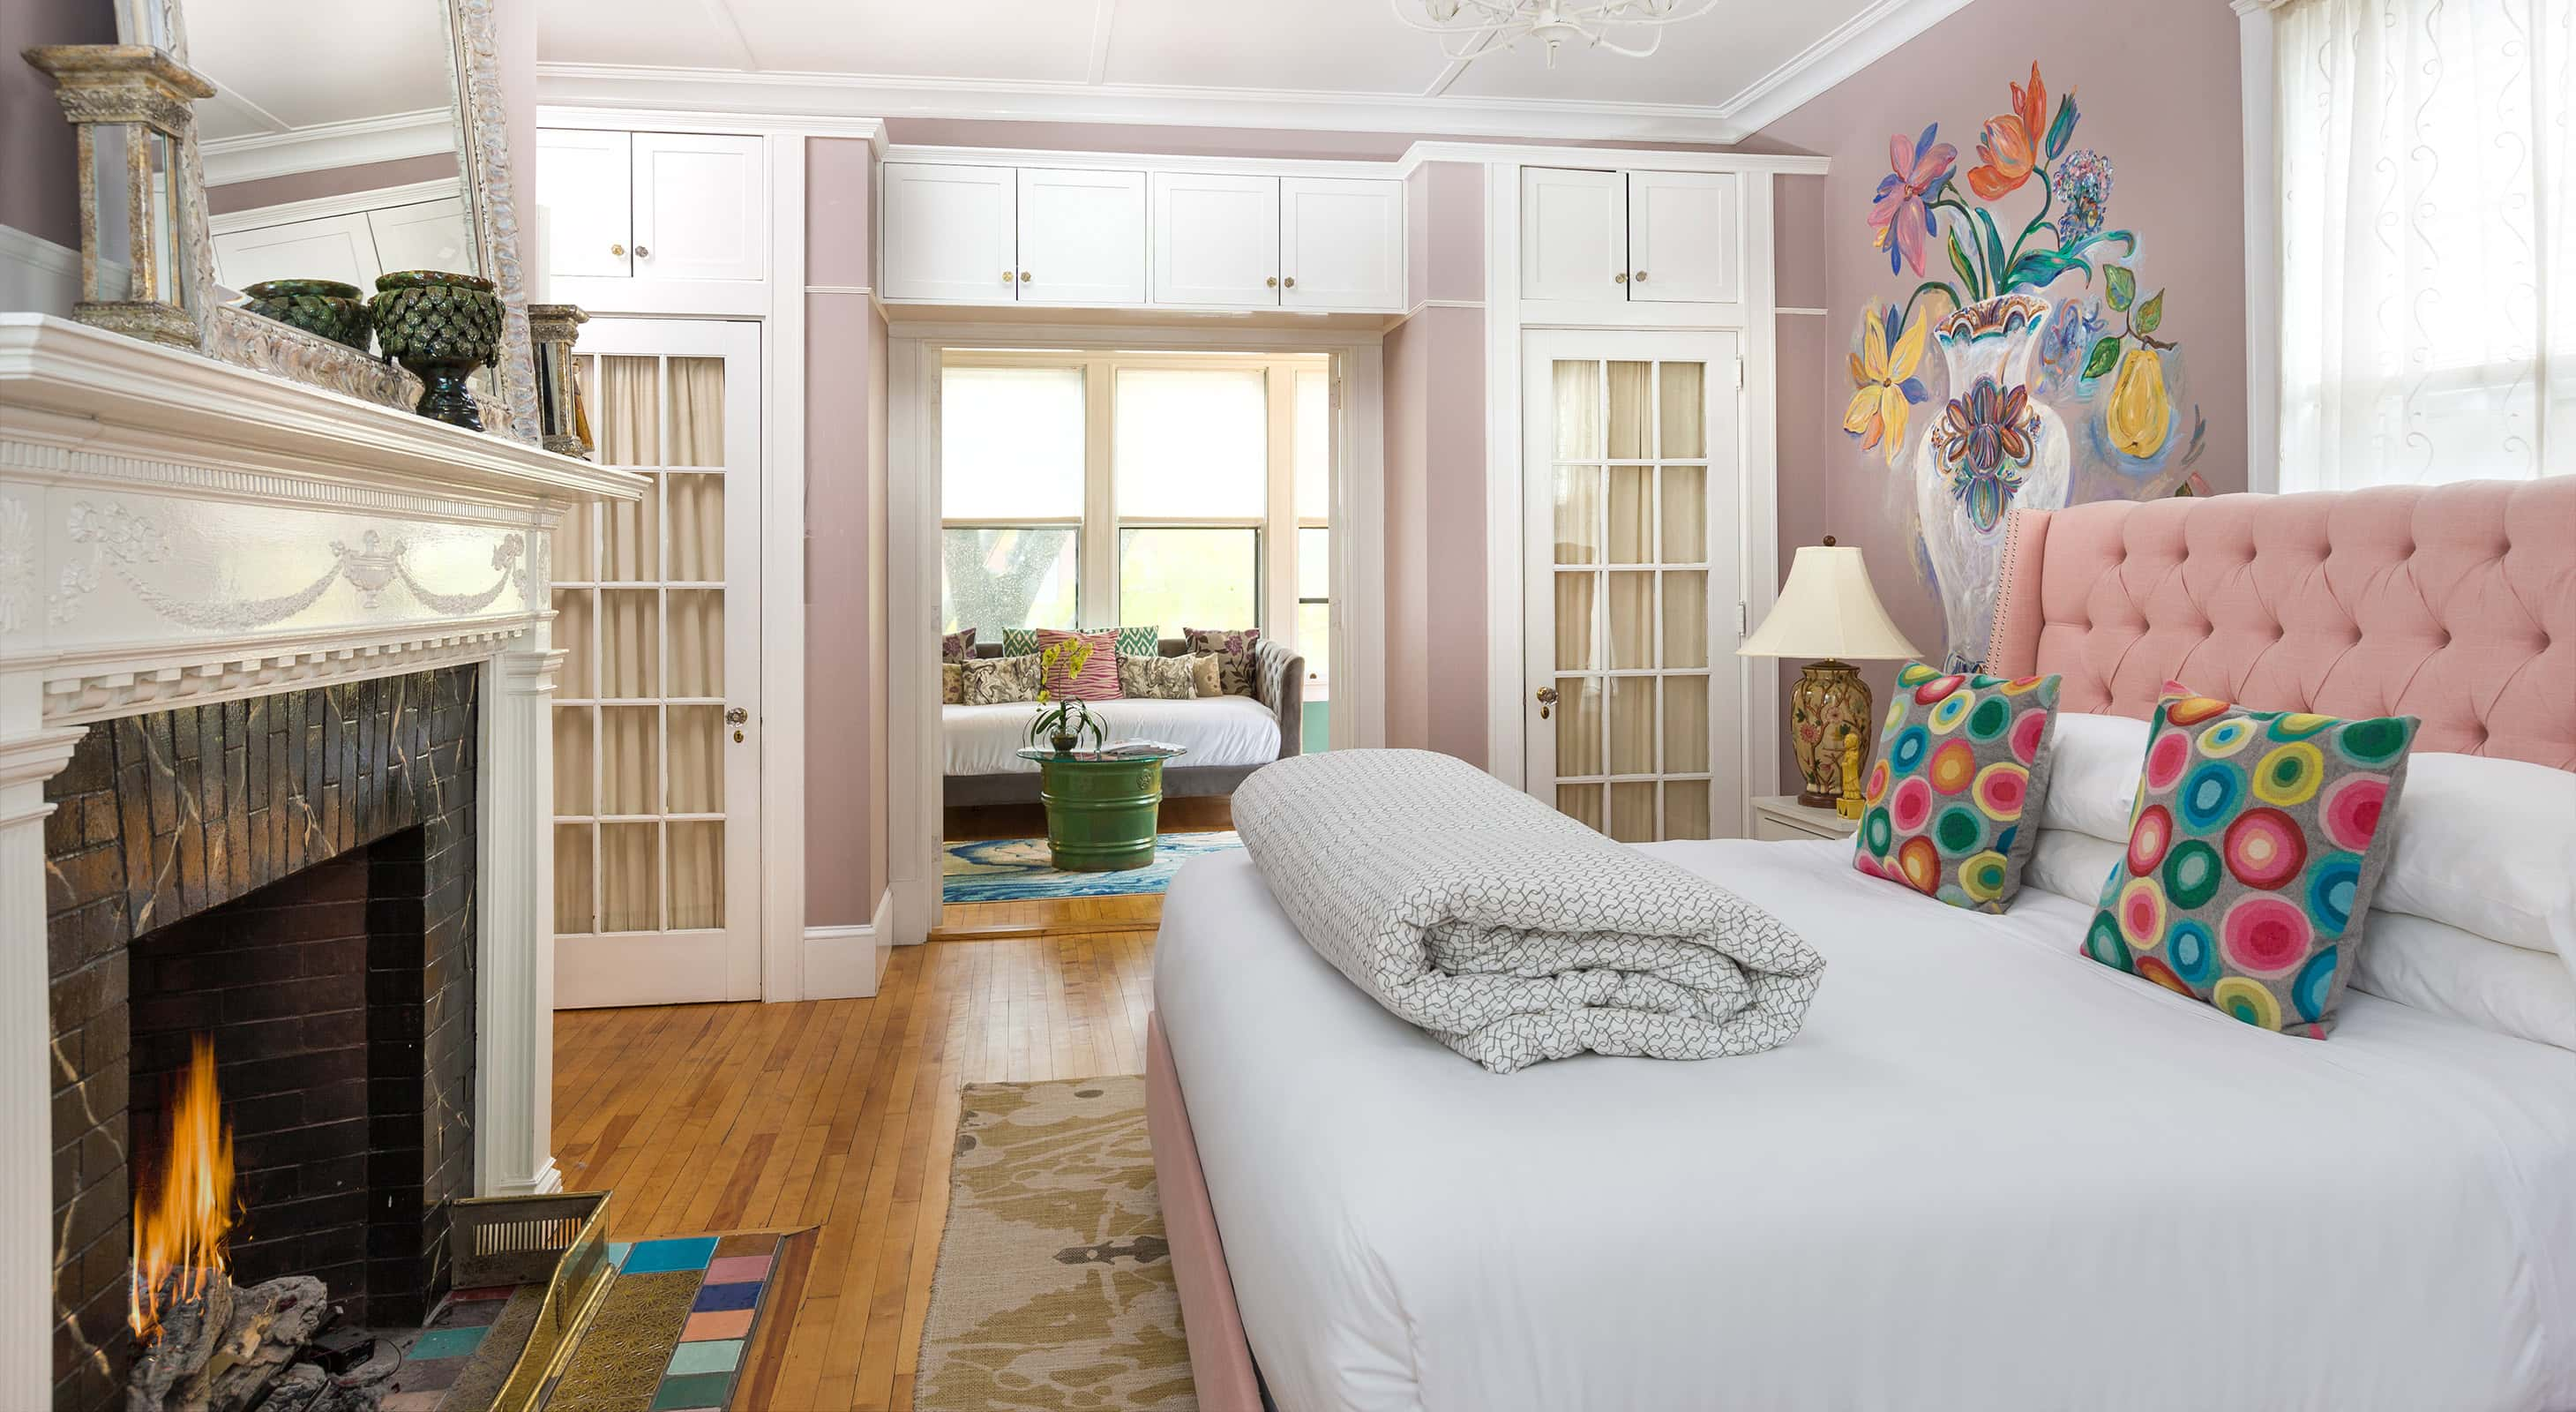 Milliken Suite - Portland Maine accommodations